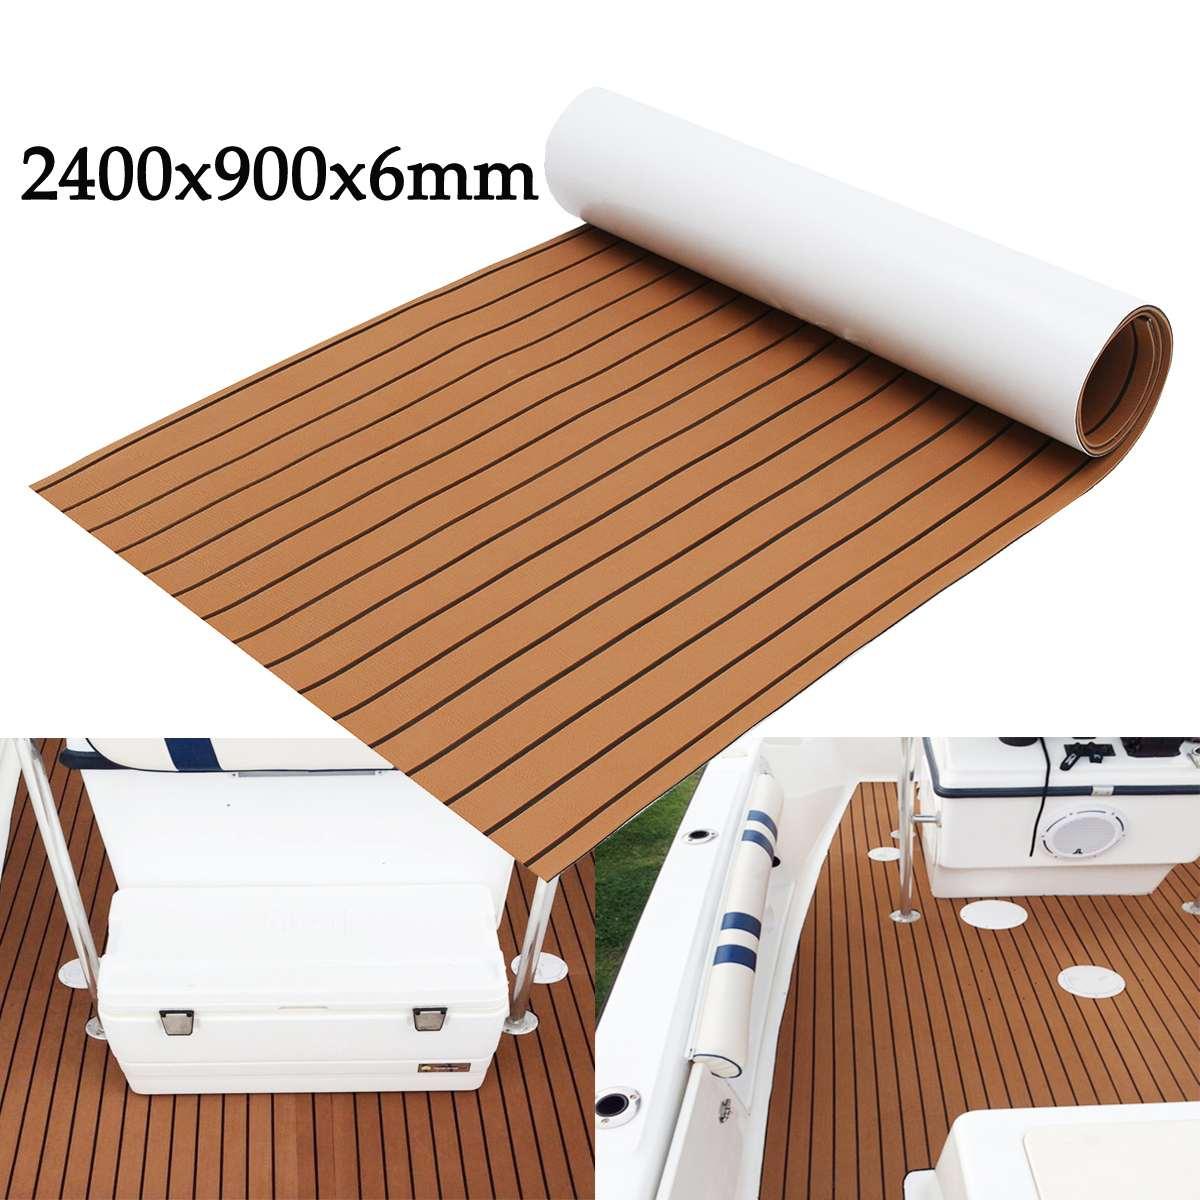 2400x900x6mm Brown Marine Flooring Faux Teak EVA Foam Boat Decking Sheet